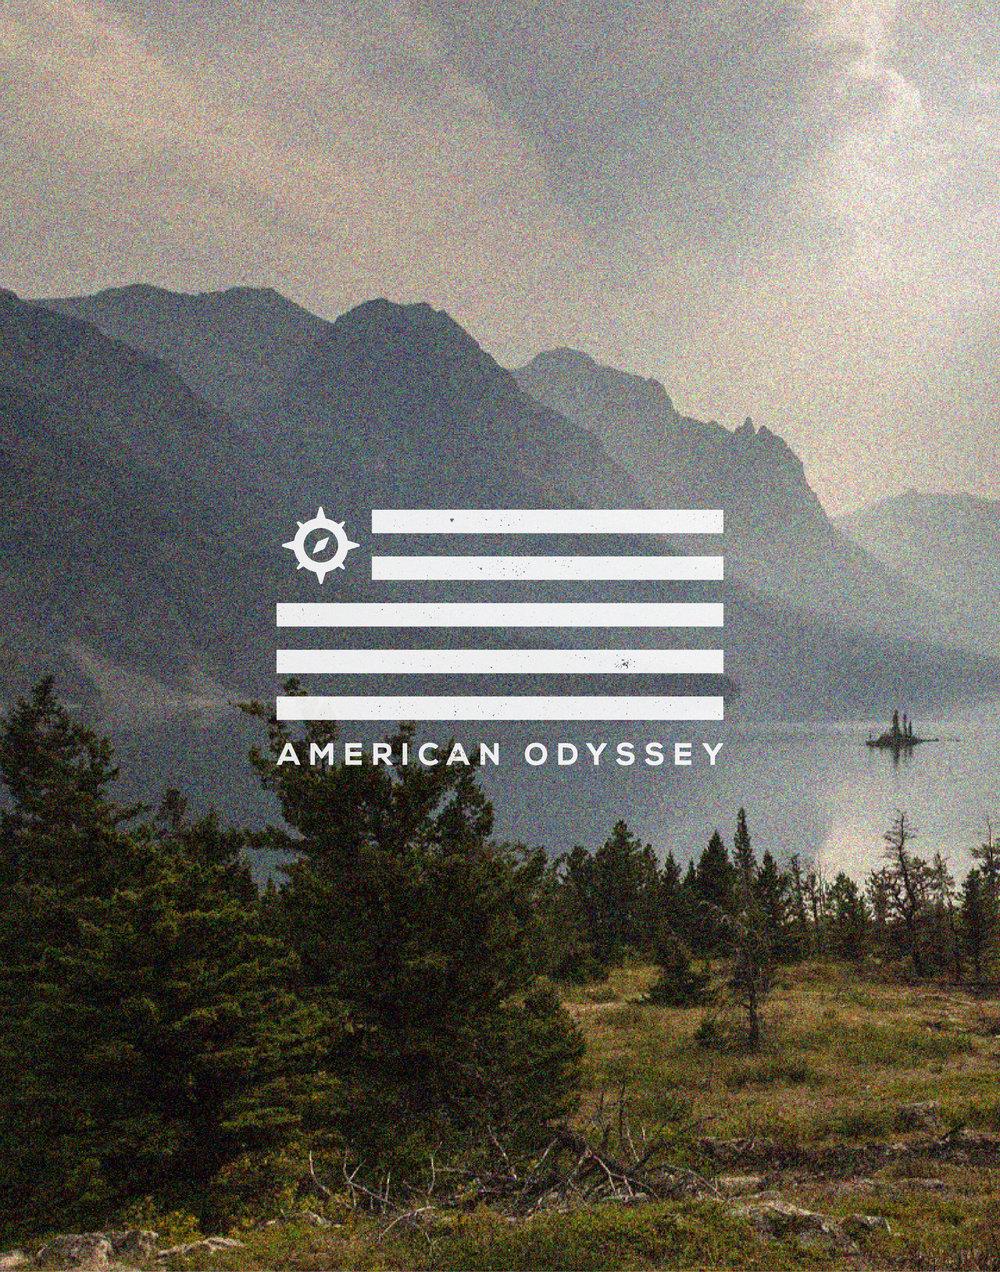 American_Odyssey_Content_Artboard 5.jpg